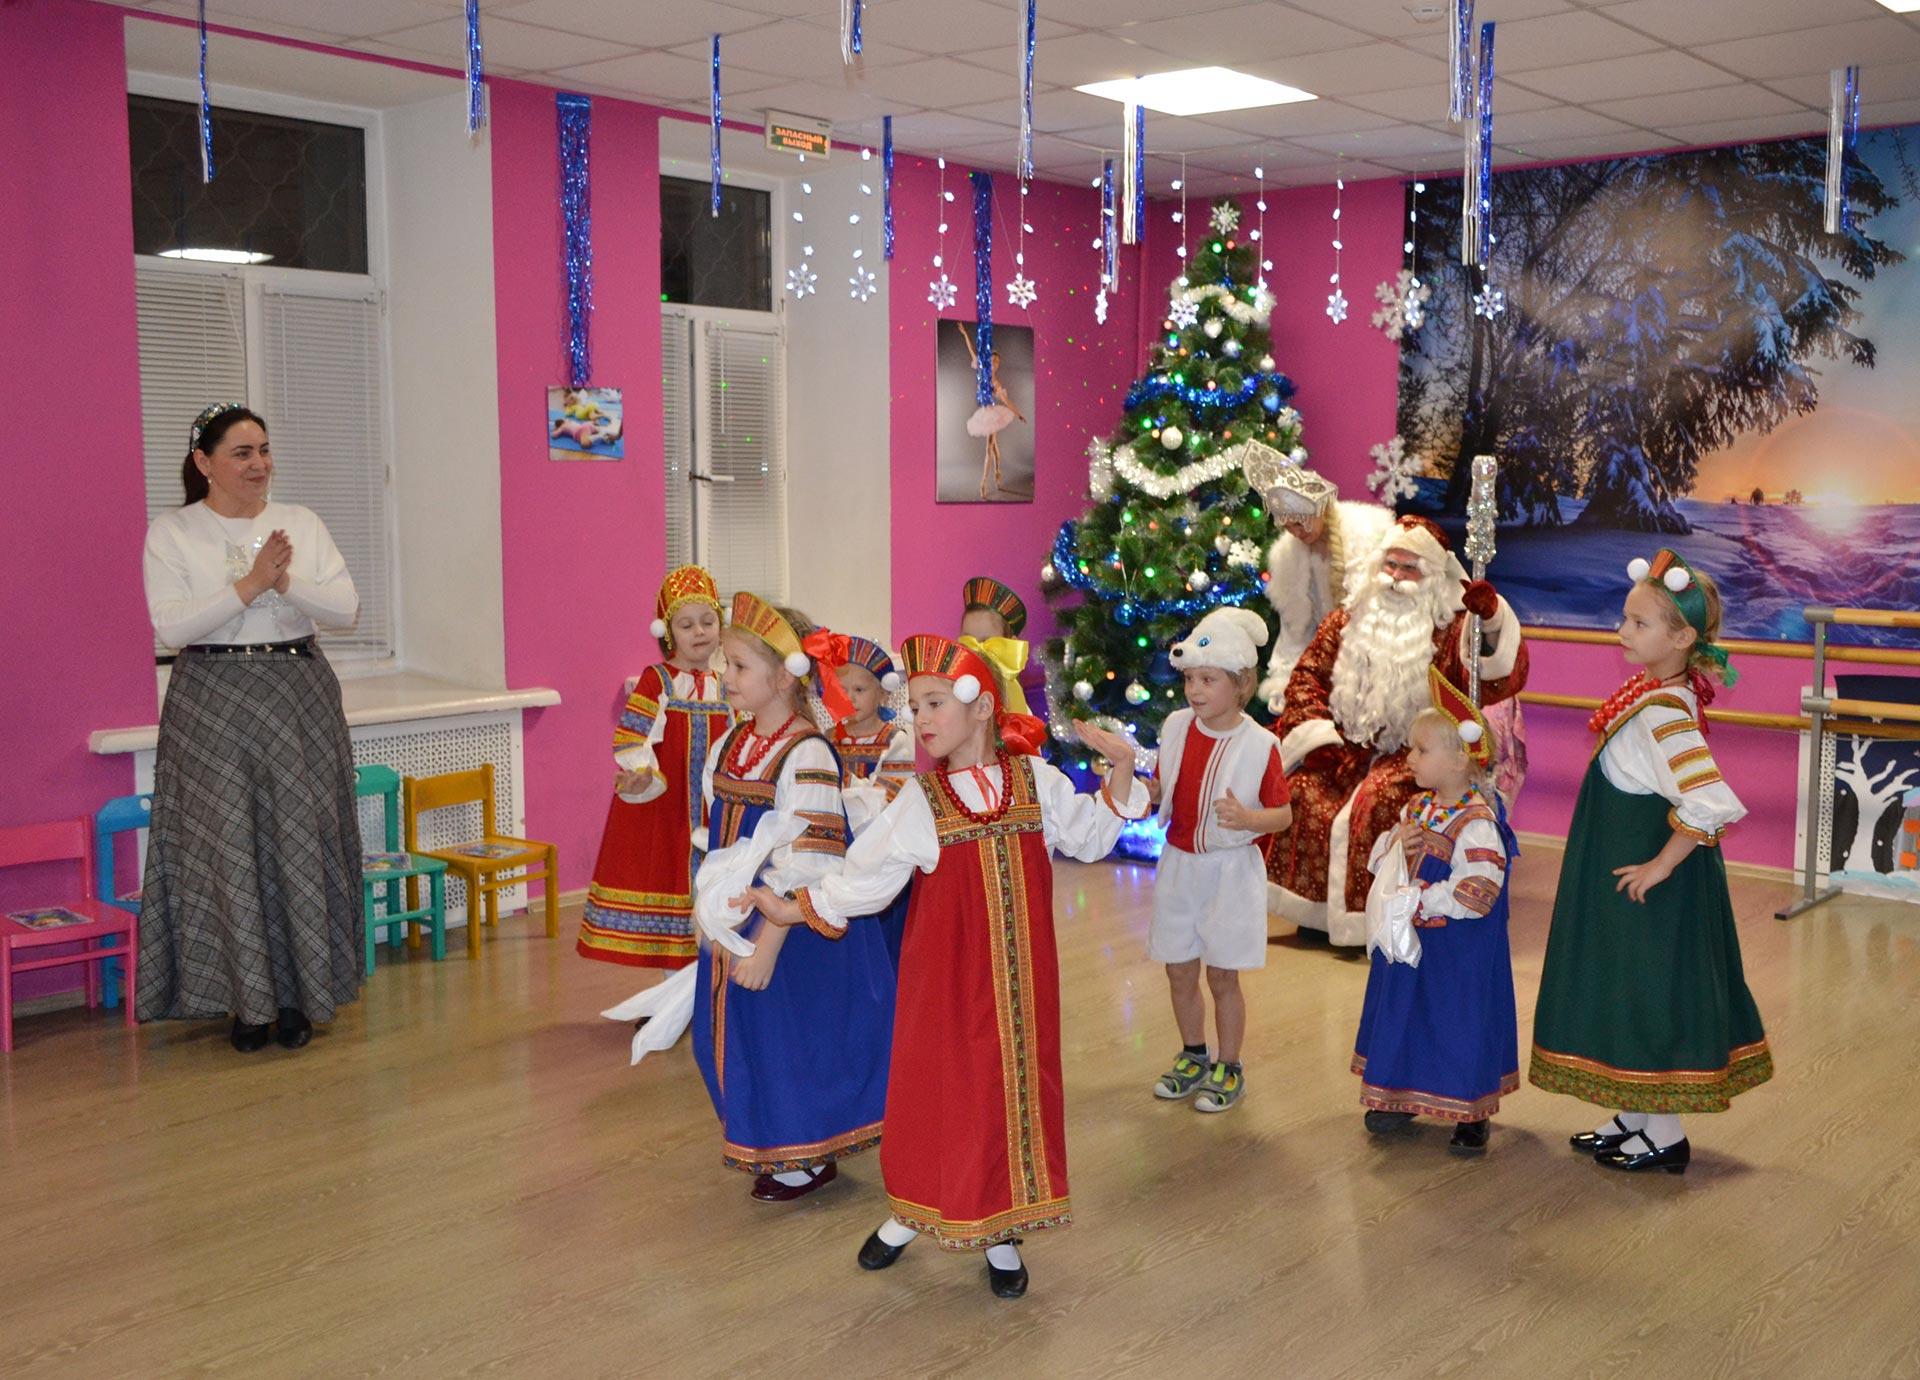 20.12.19 прошла Елка в Мини детском саду ДЦК «Шанс»